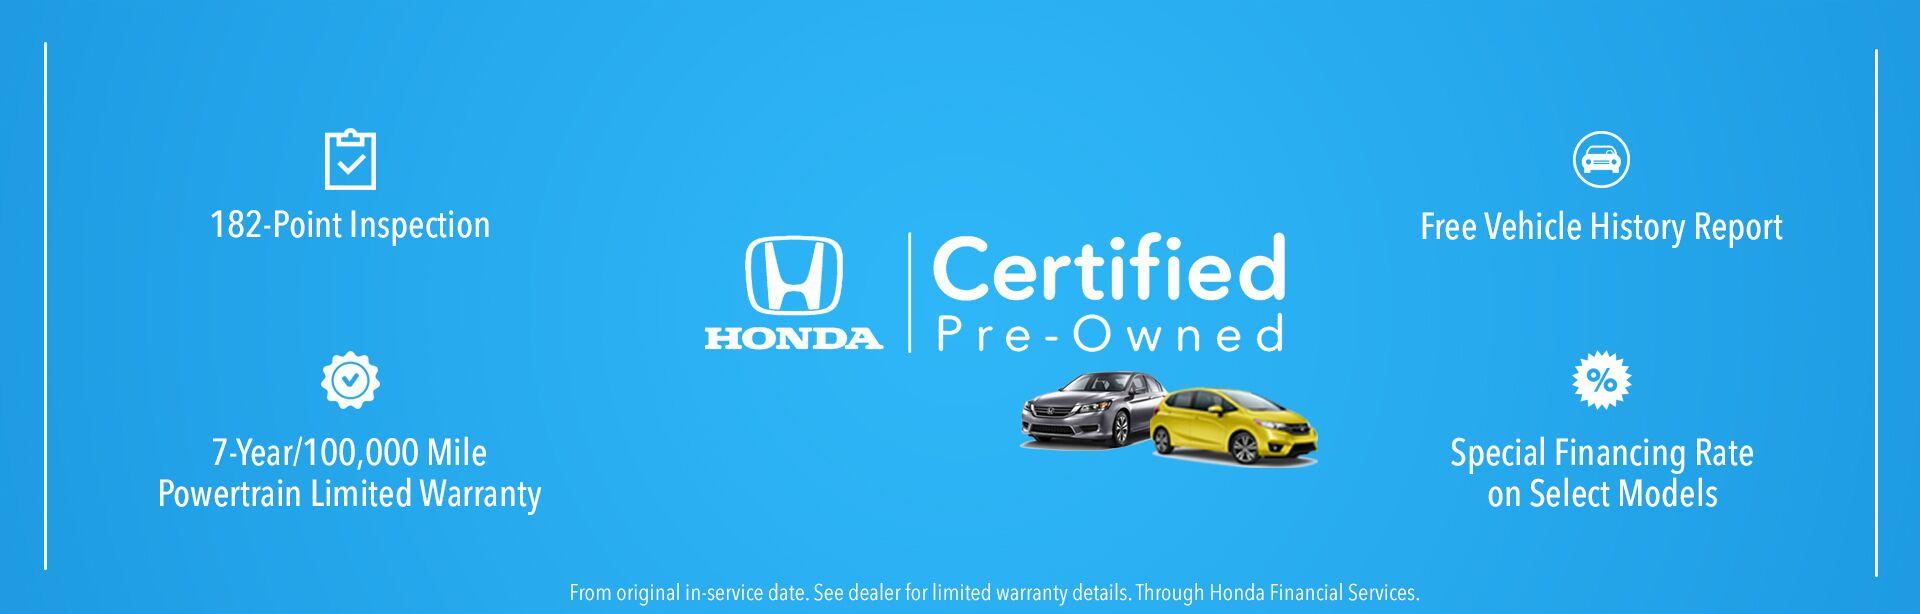 Honda Dealership Johnson City TN | Used Cars Johnson City Honda